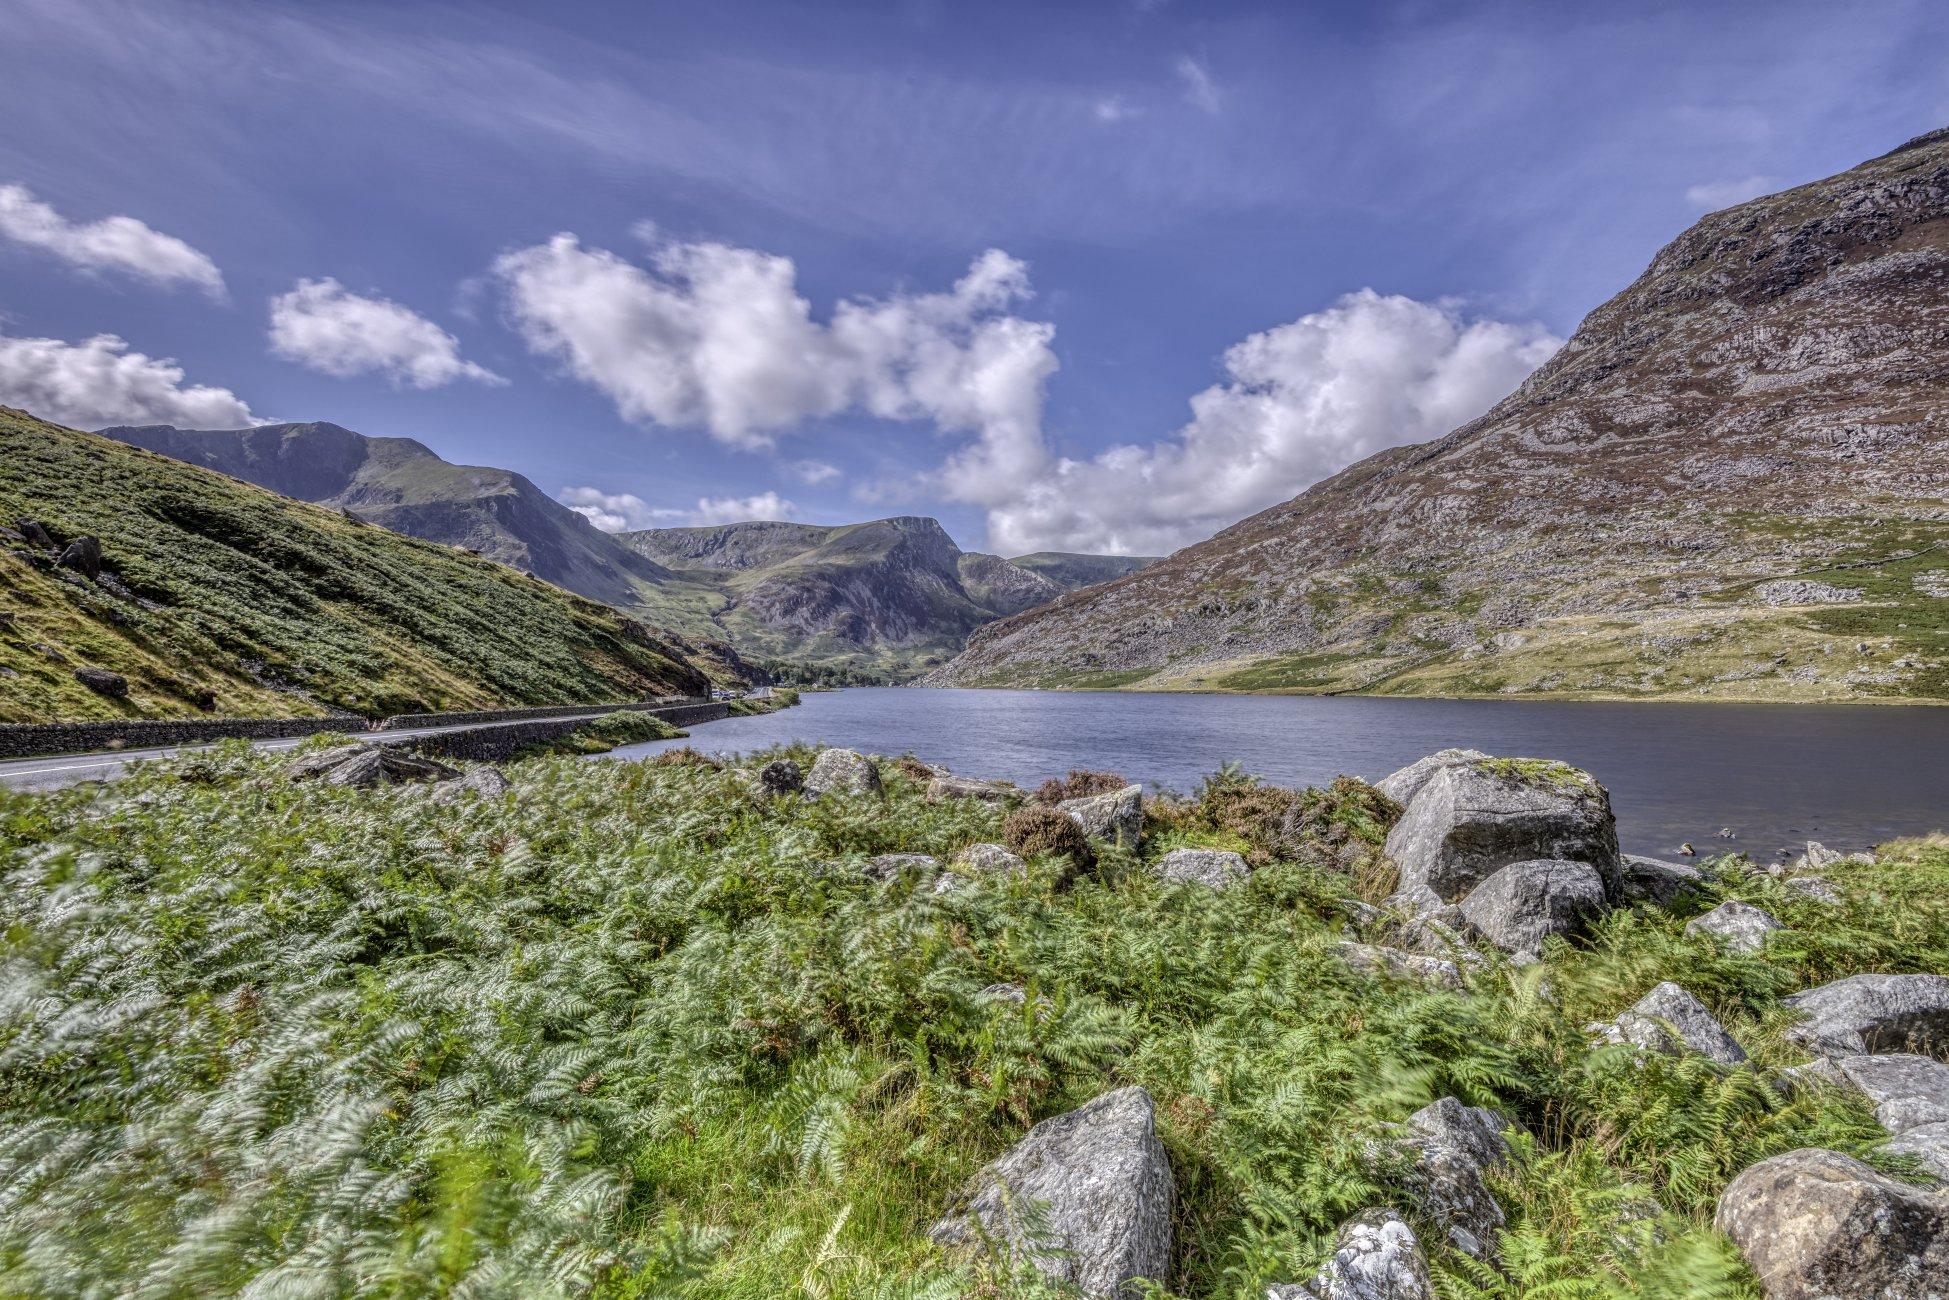 Welsh lake scene